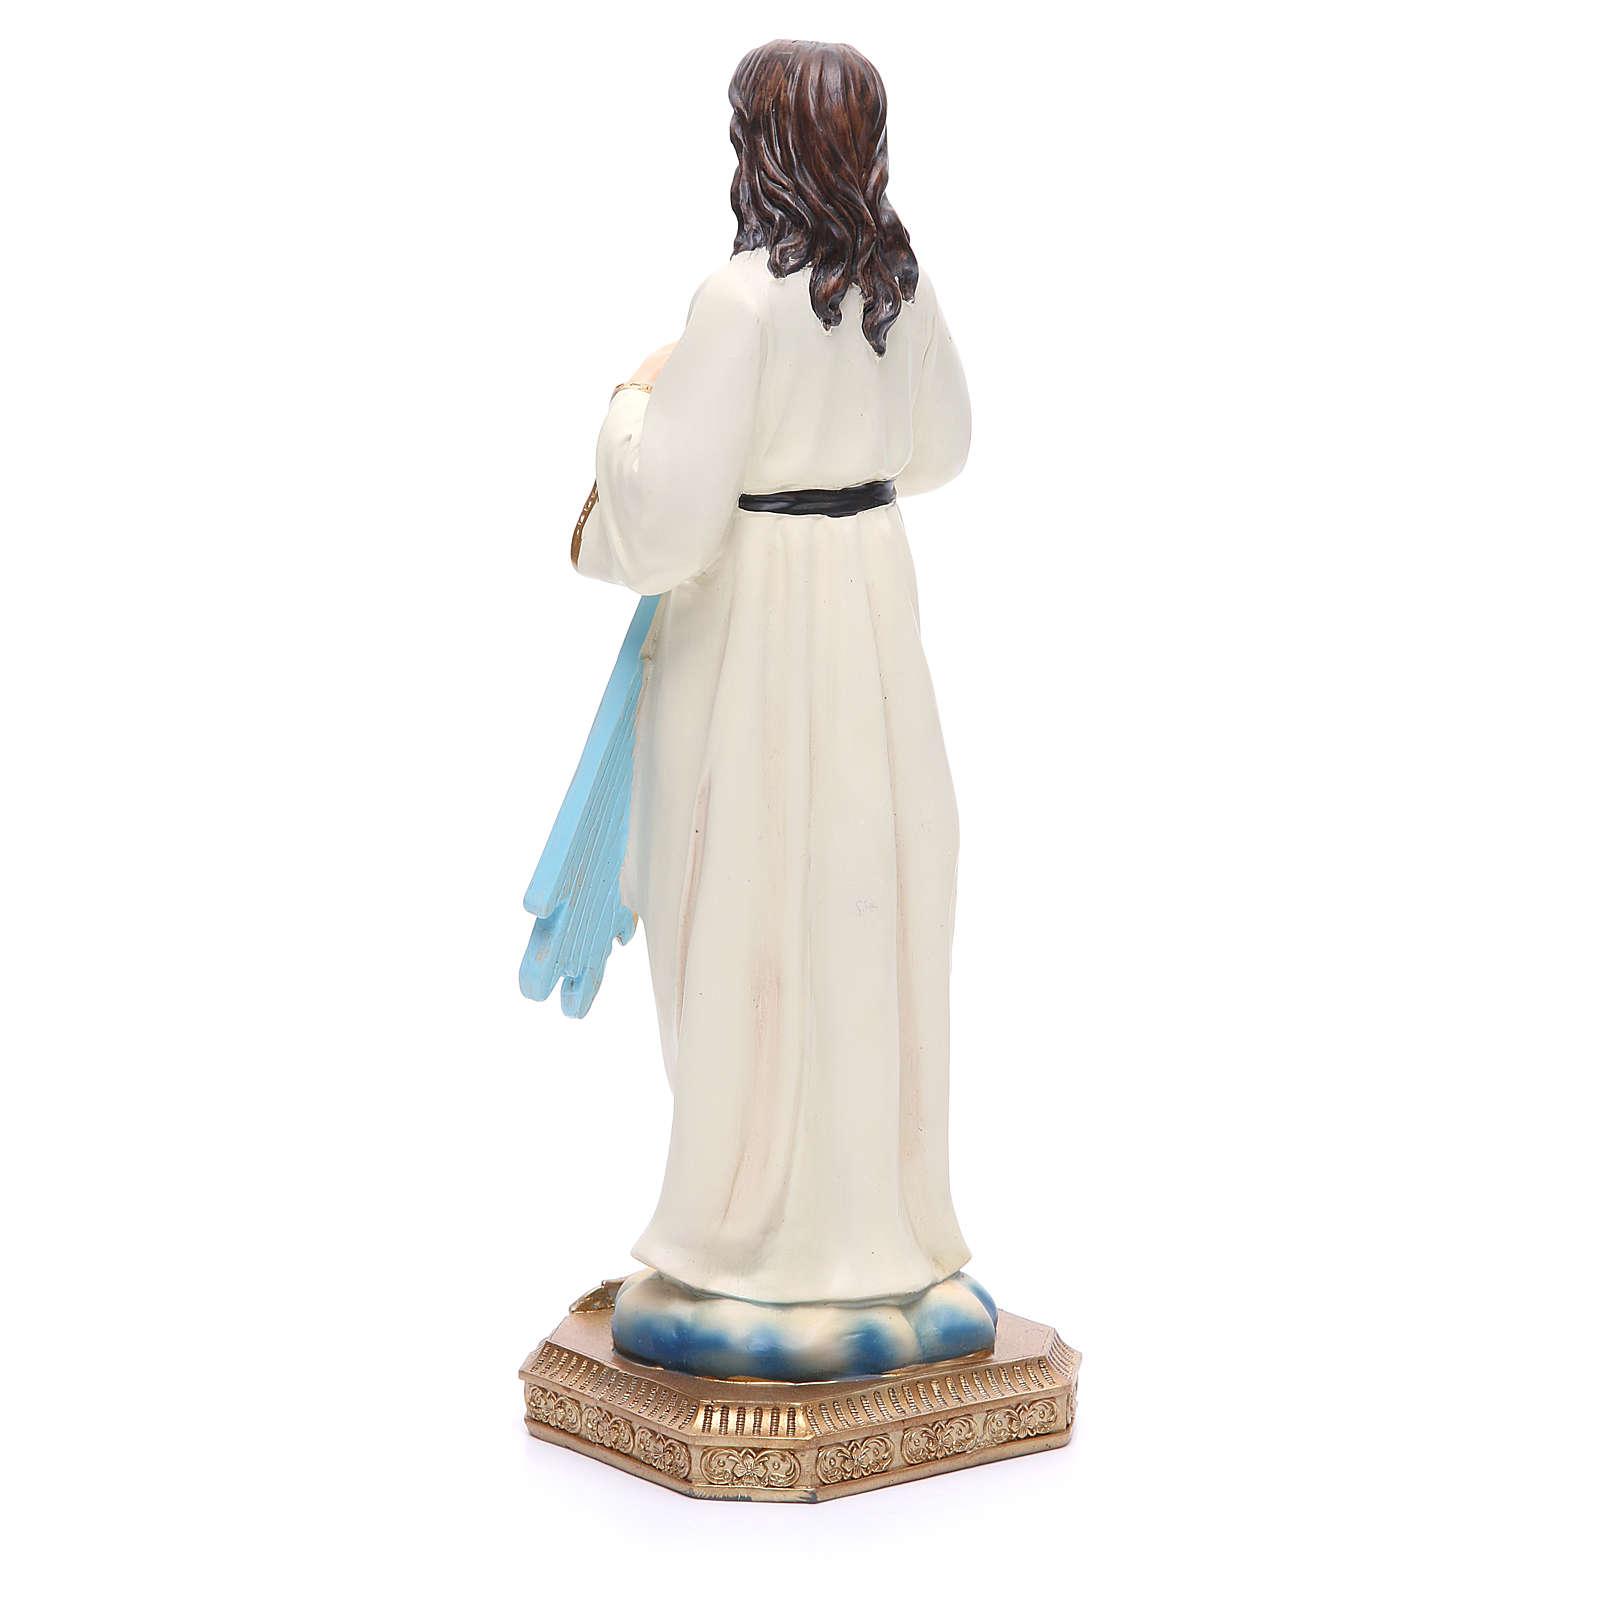 Statua Gesù Misericordioso 30,5 cm resina colorata 4